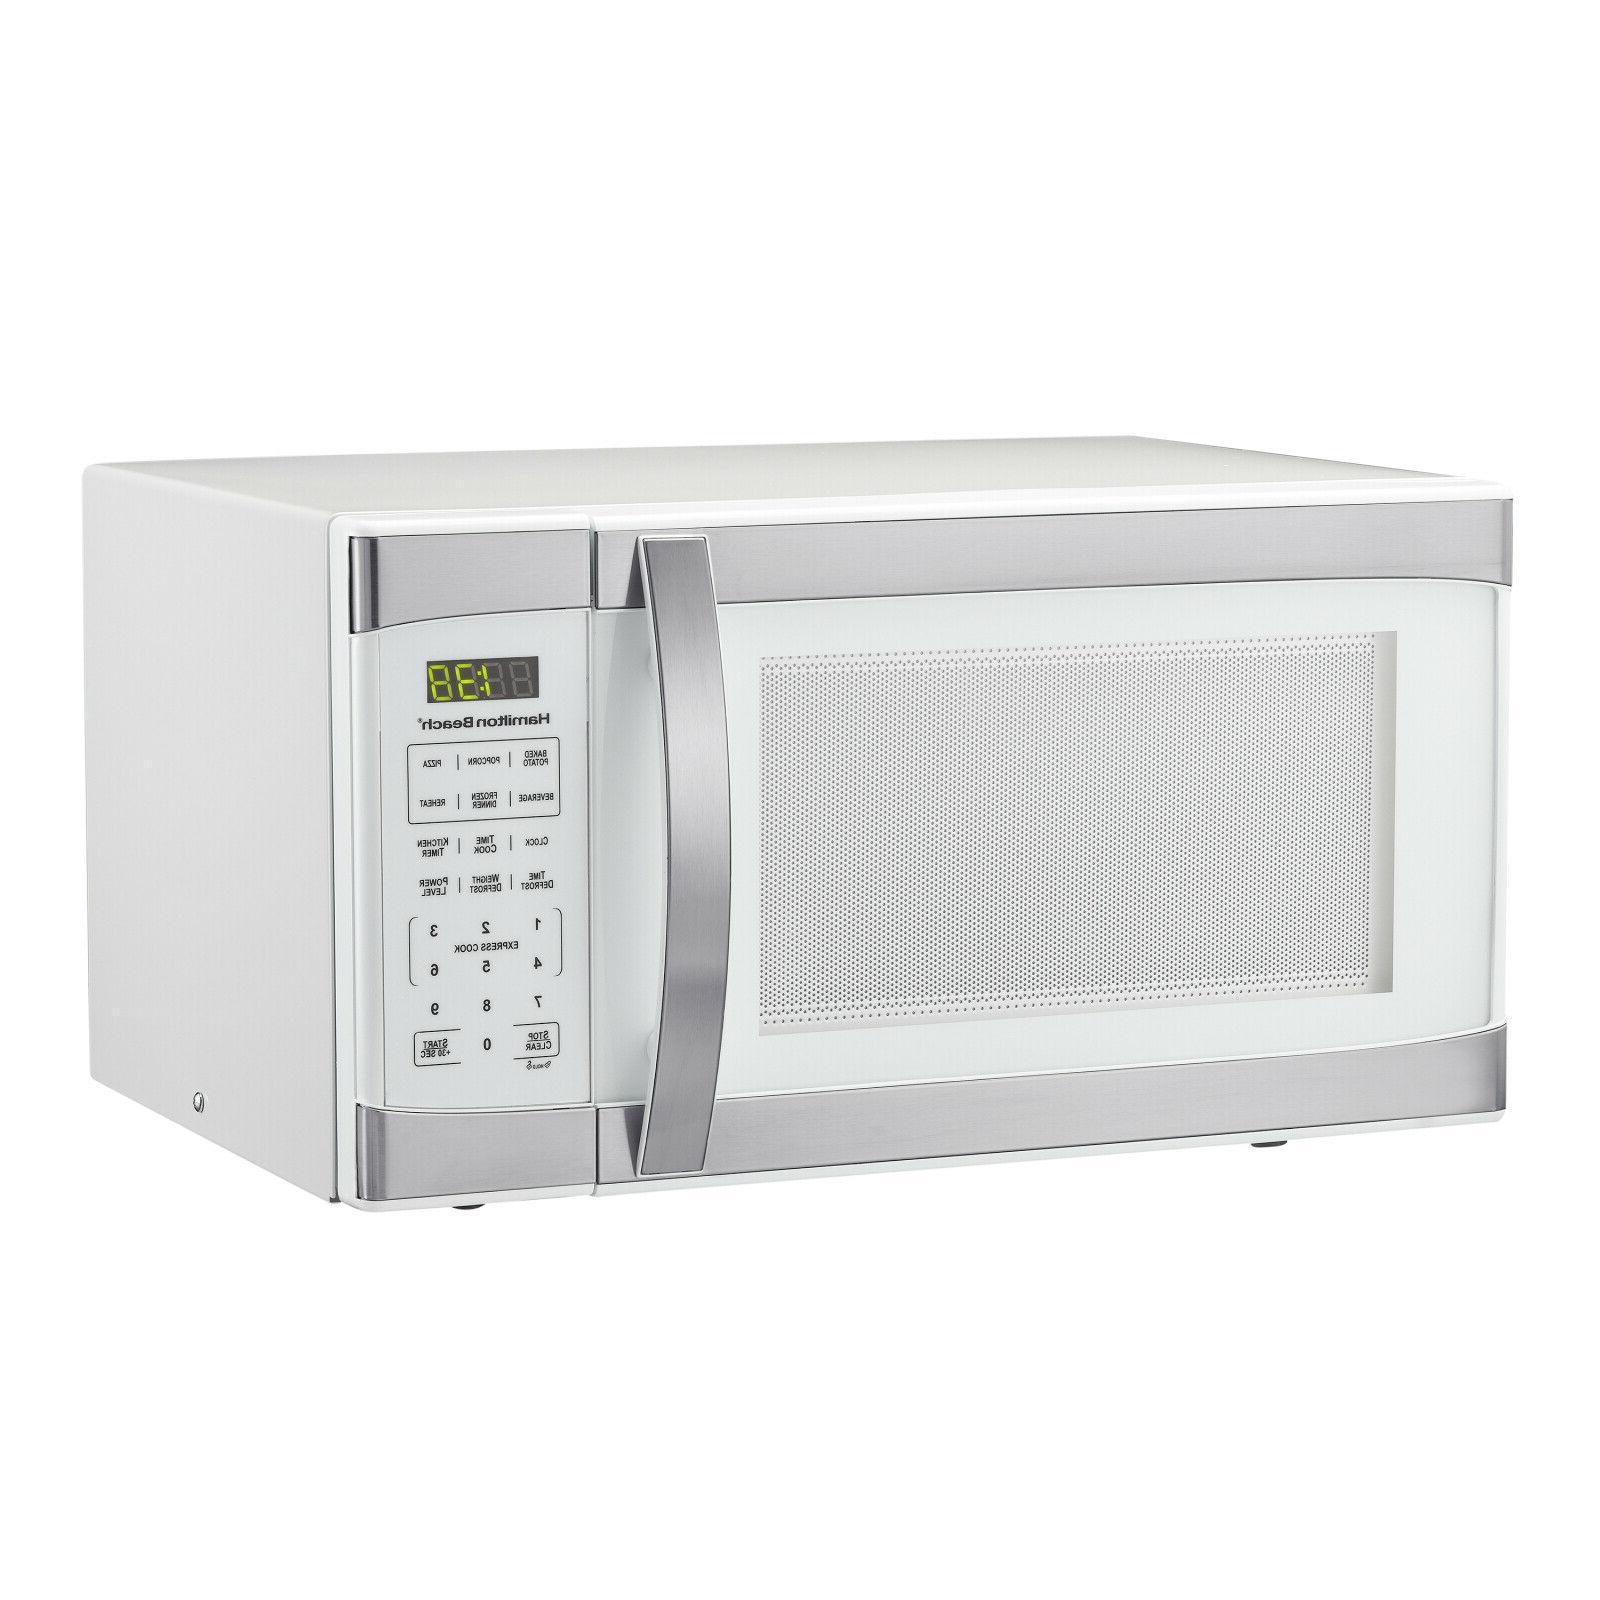 Hamilton 1.1 White Stainless Steel Digital Microwave